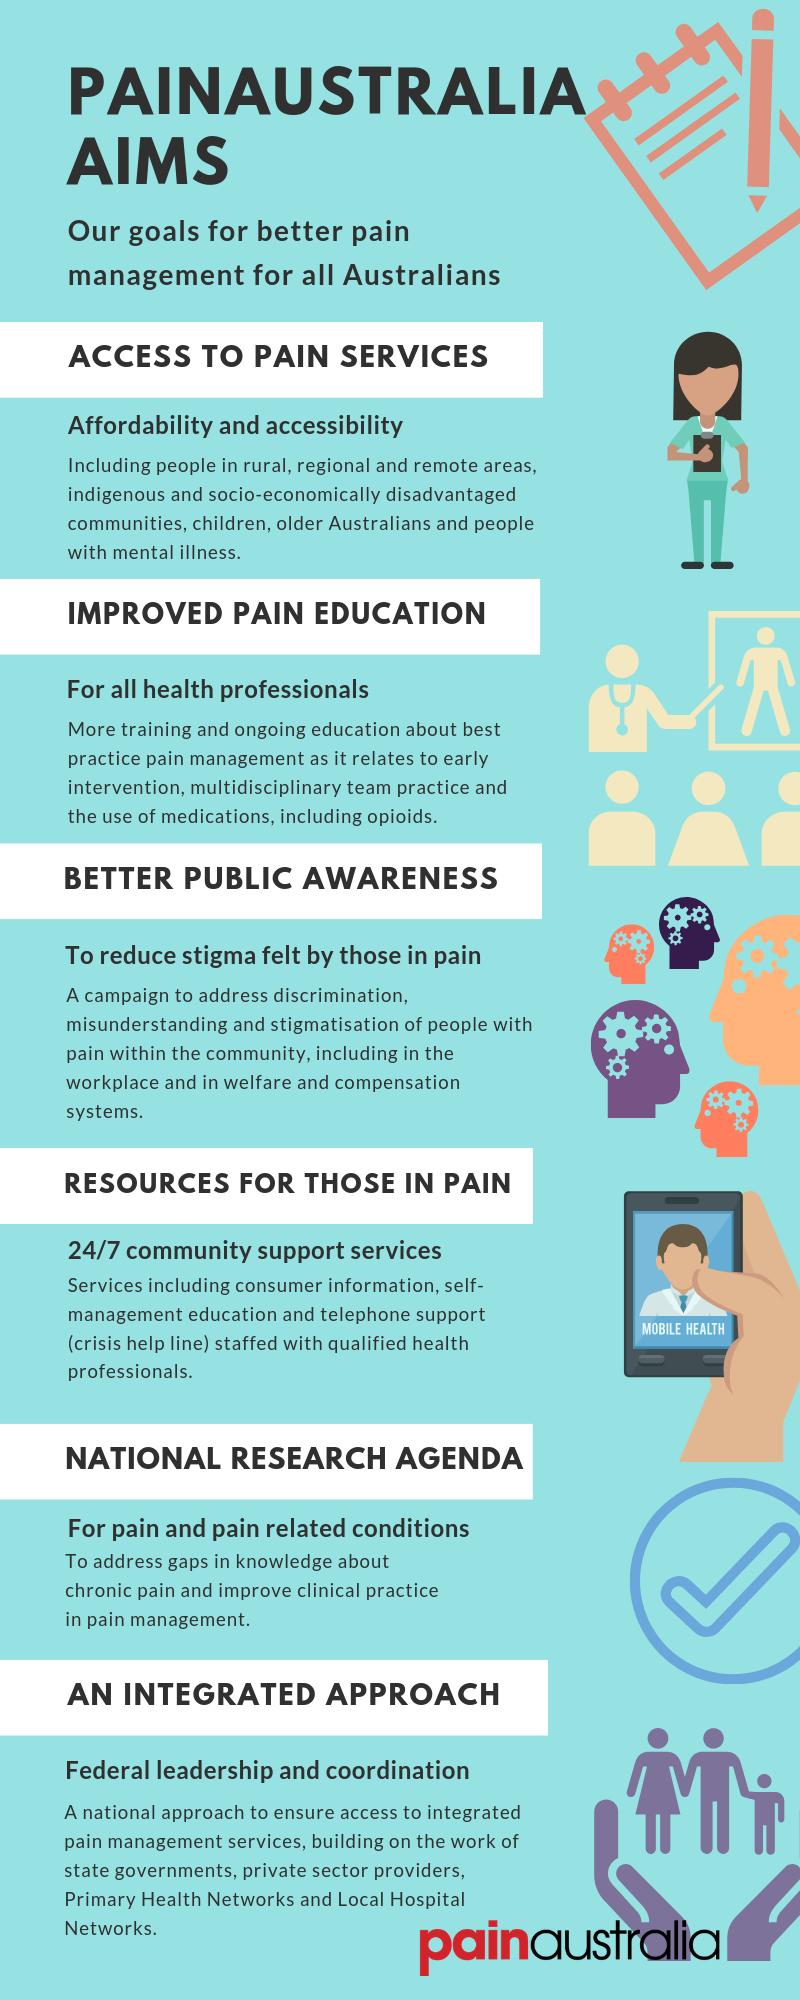 PAINAUSTRALIA AIMS infographic.png